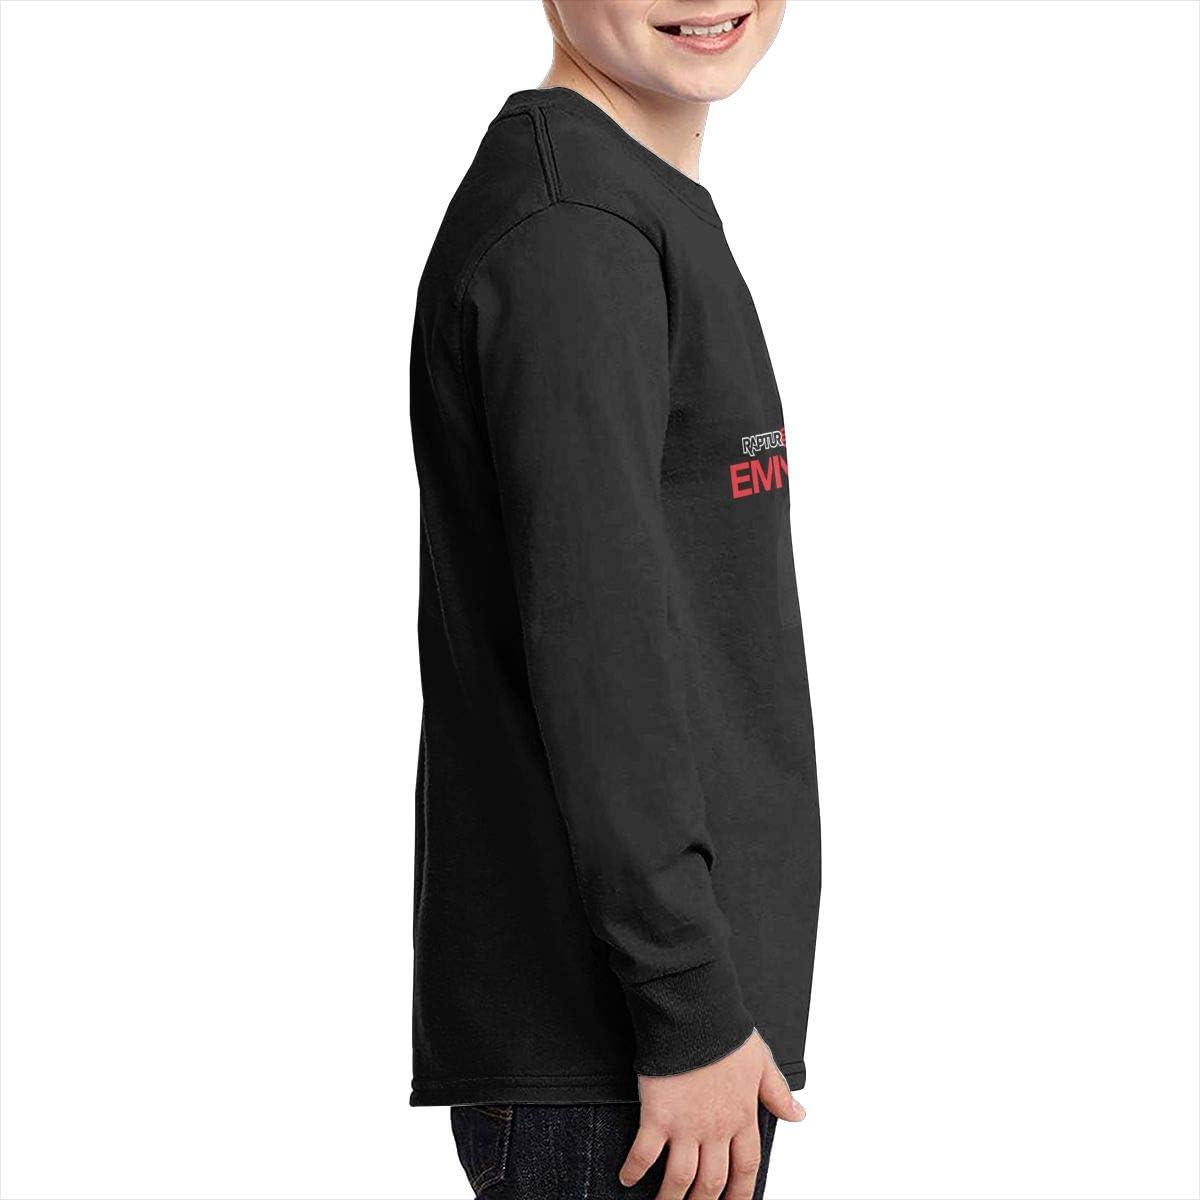 MichaelHazzard Eminem Youth Wearable Long Sleeve Crewneck Tee T-Shirt for Boys and Girls